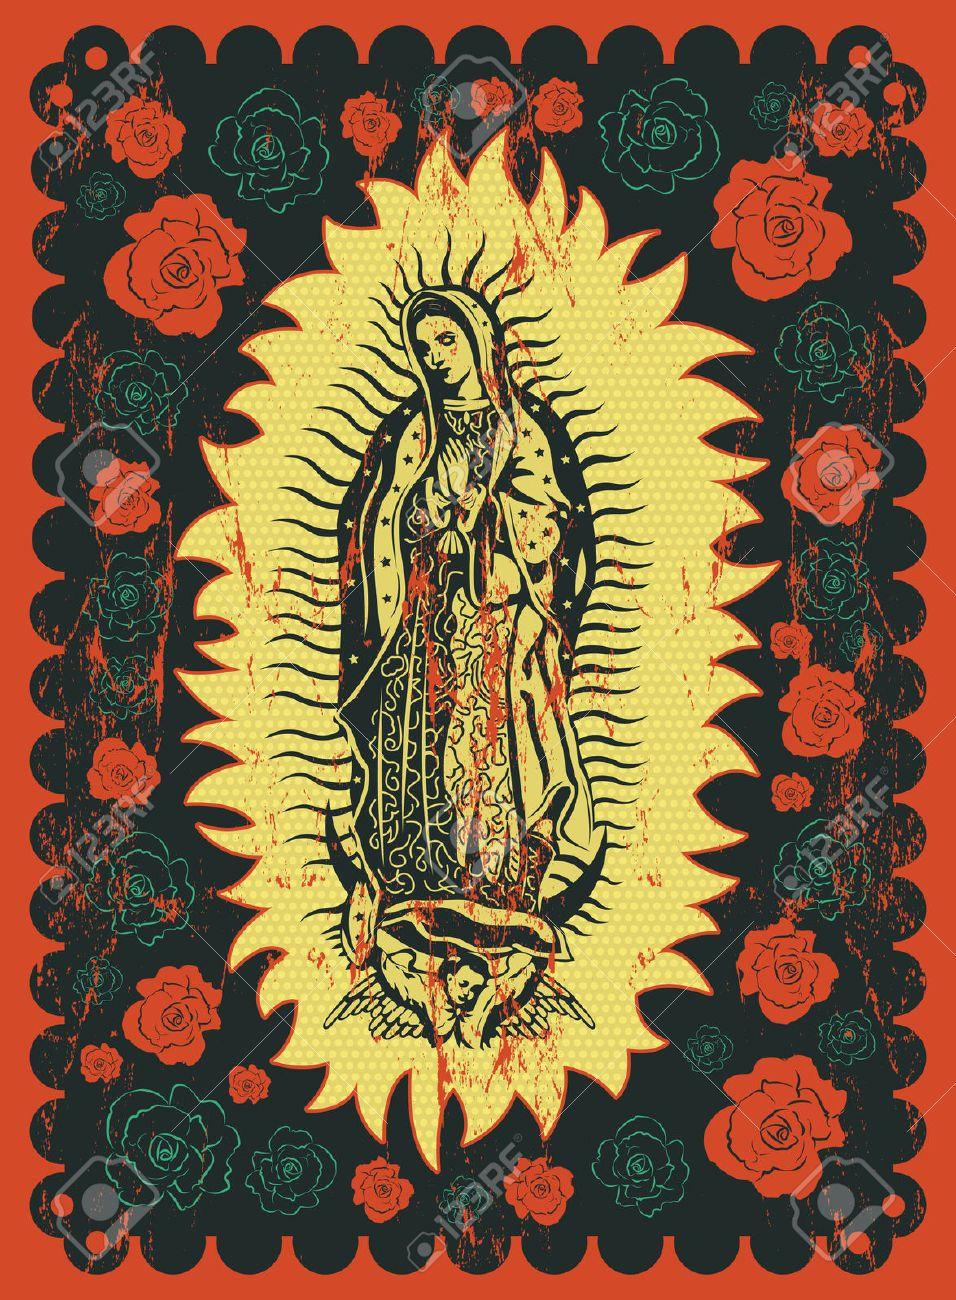 maria guadalupe mexican - Szukaj w Google | Arte Popular Mexicana ...